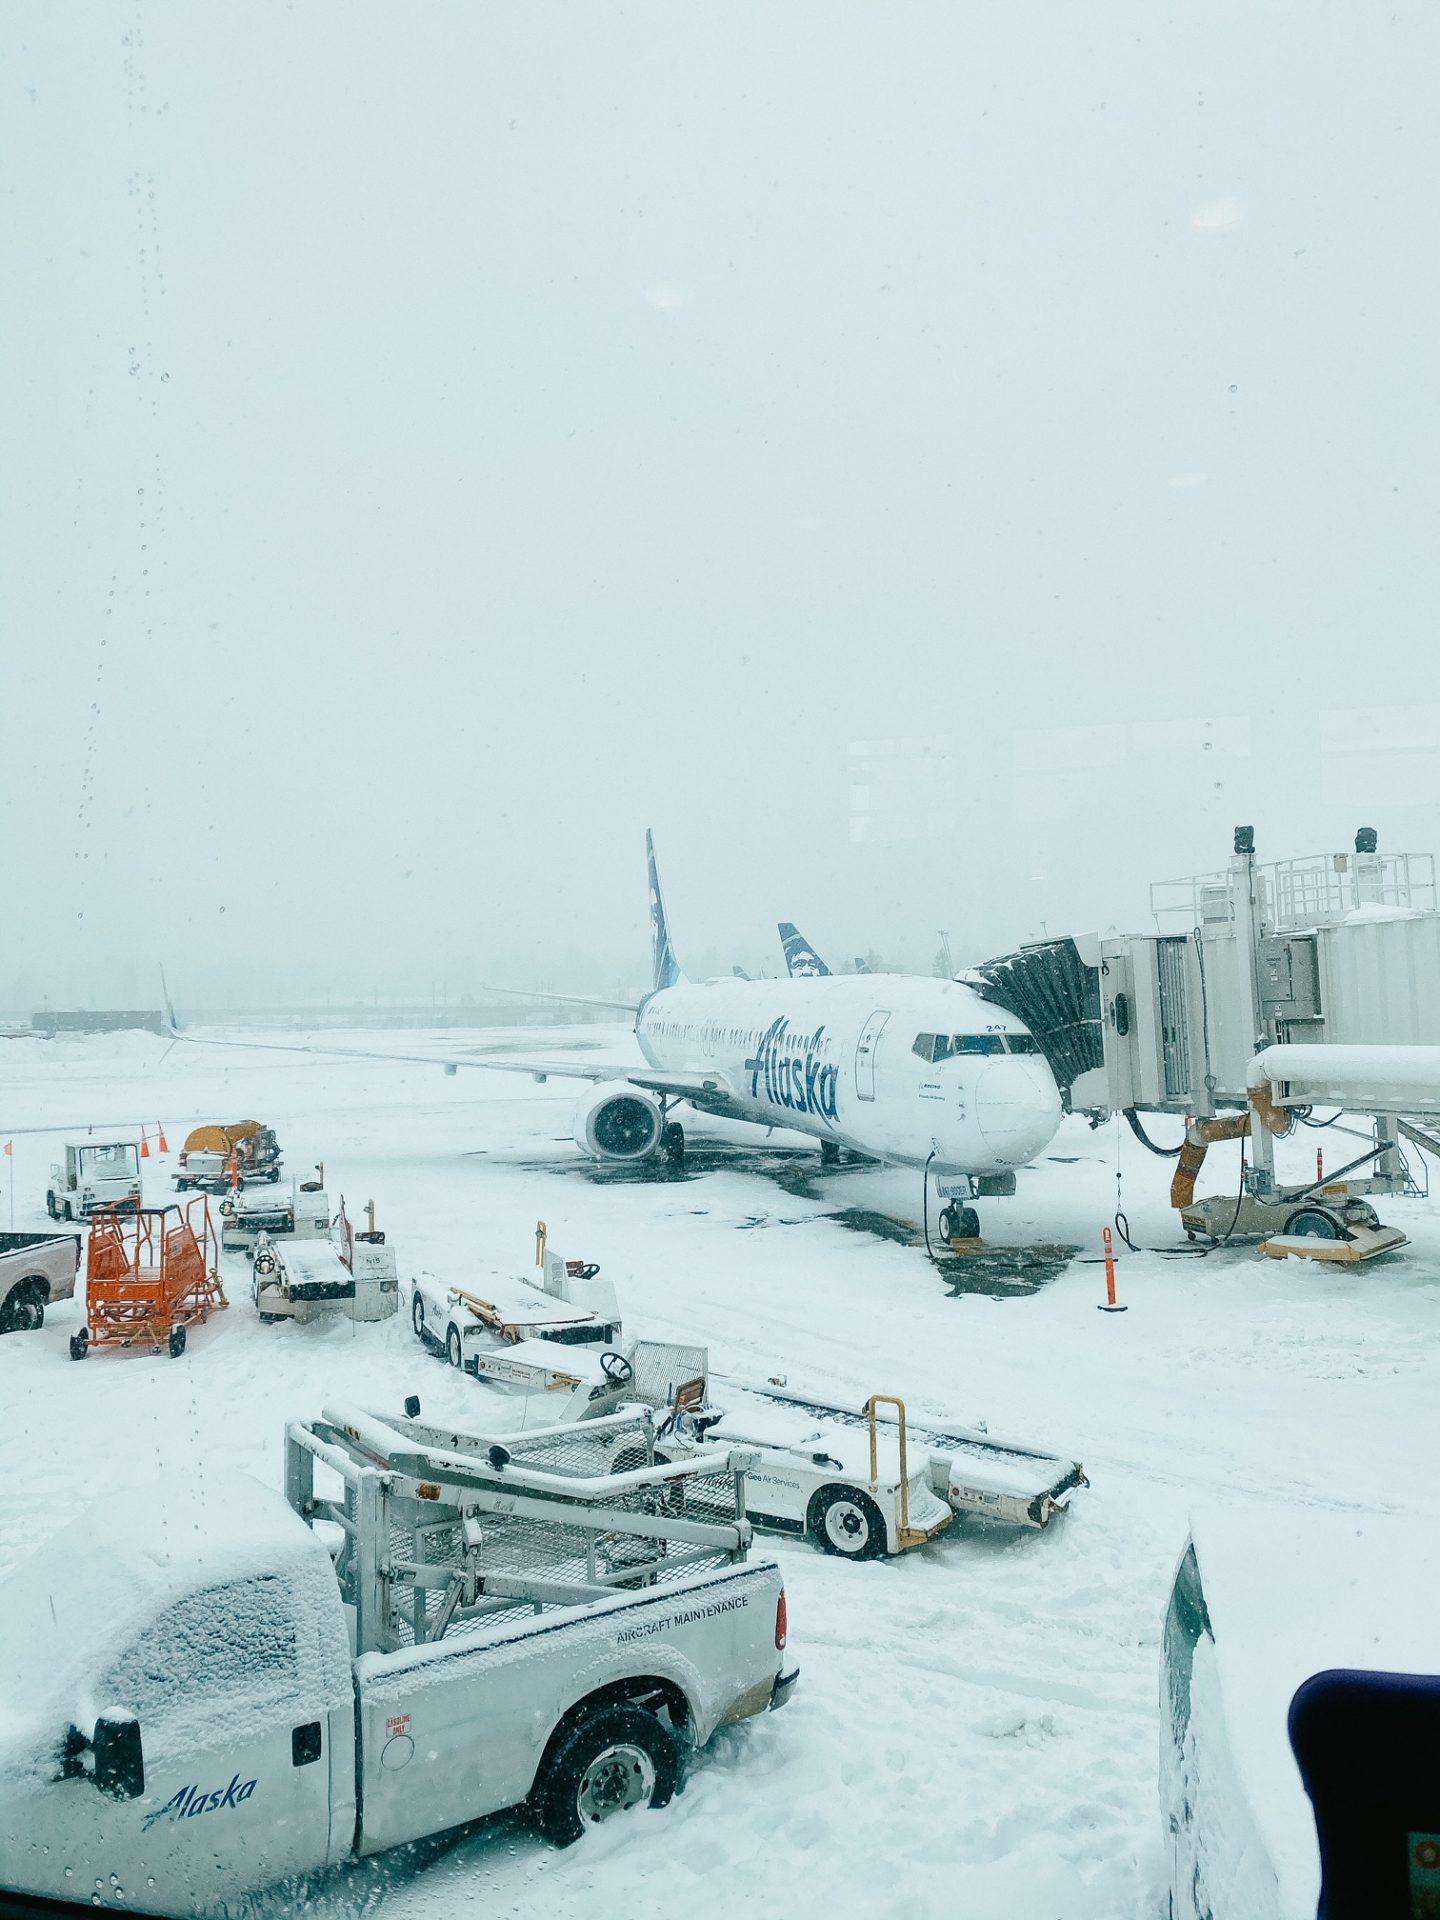 pnw canceled flights